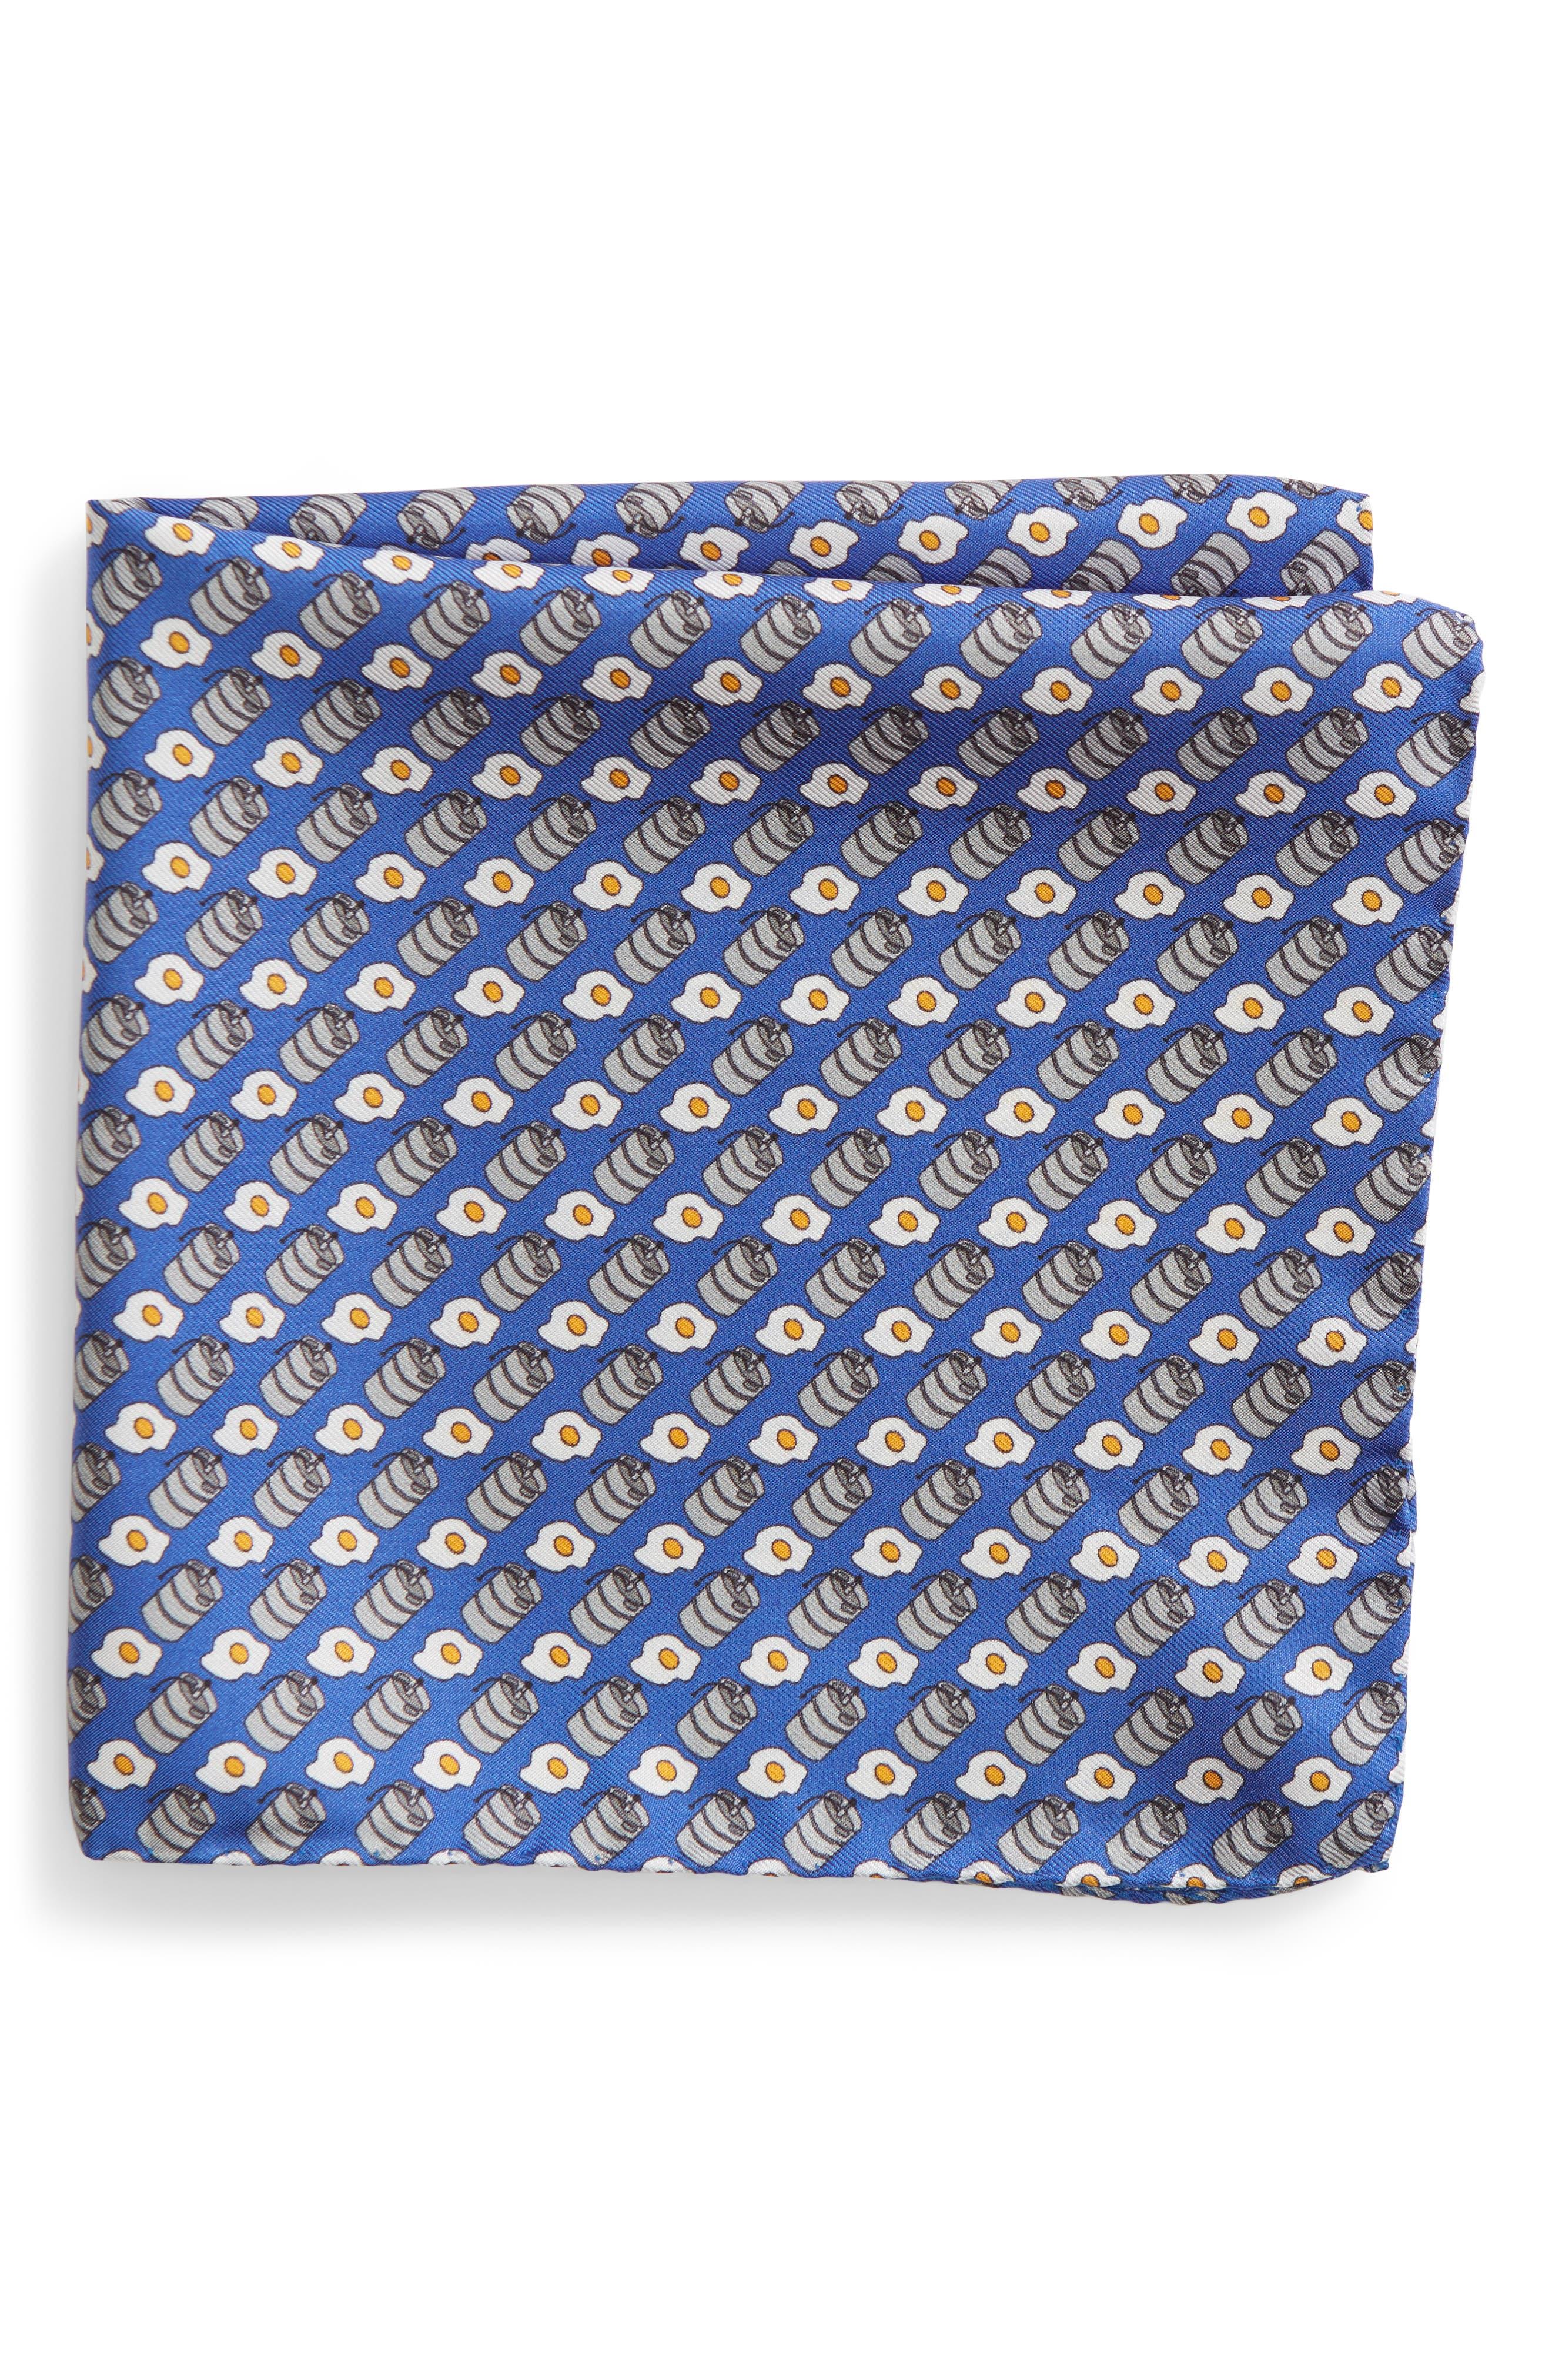 Kegs & Eggs Silk Pocket Square,                         Main,                         color, Blue